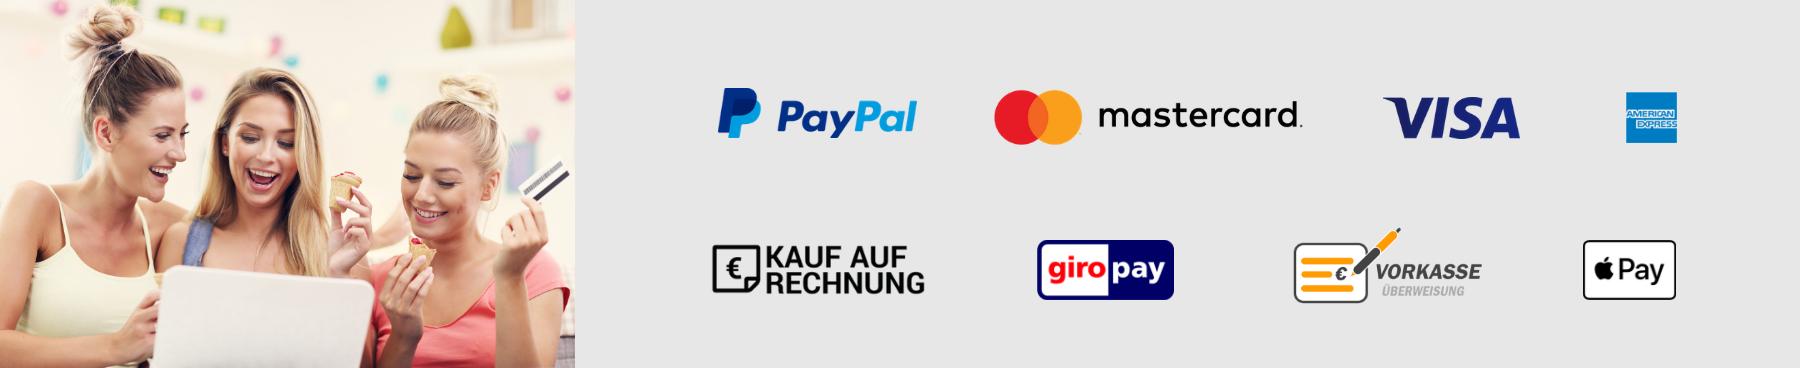 Zahlungsarten-Logo-Leiste-1800x368K0iM3xPfZE0d4